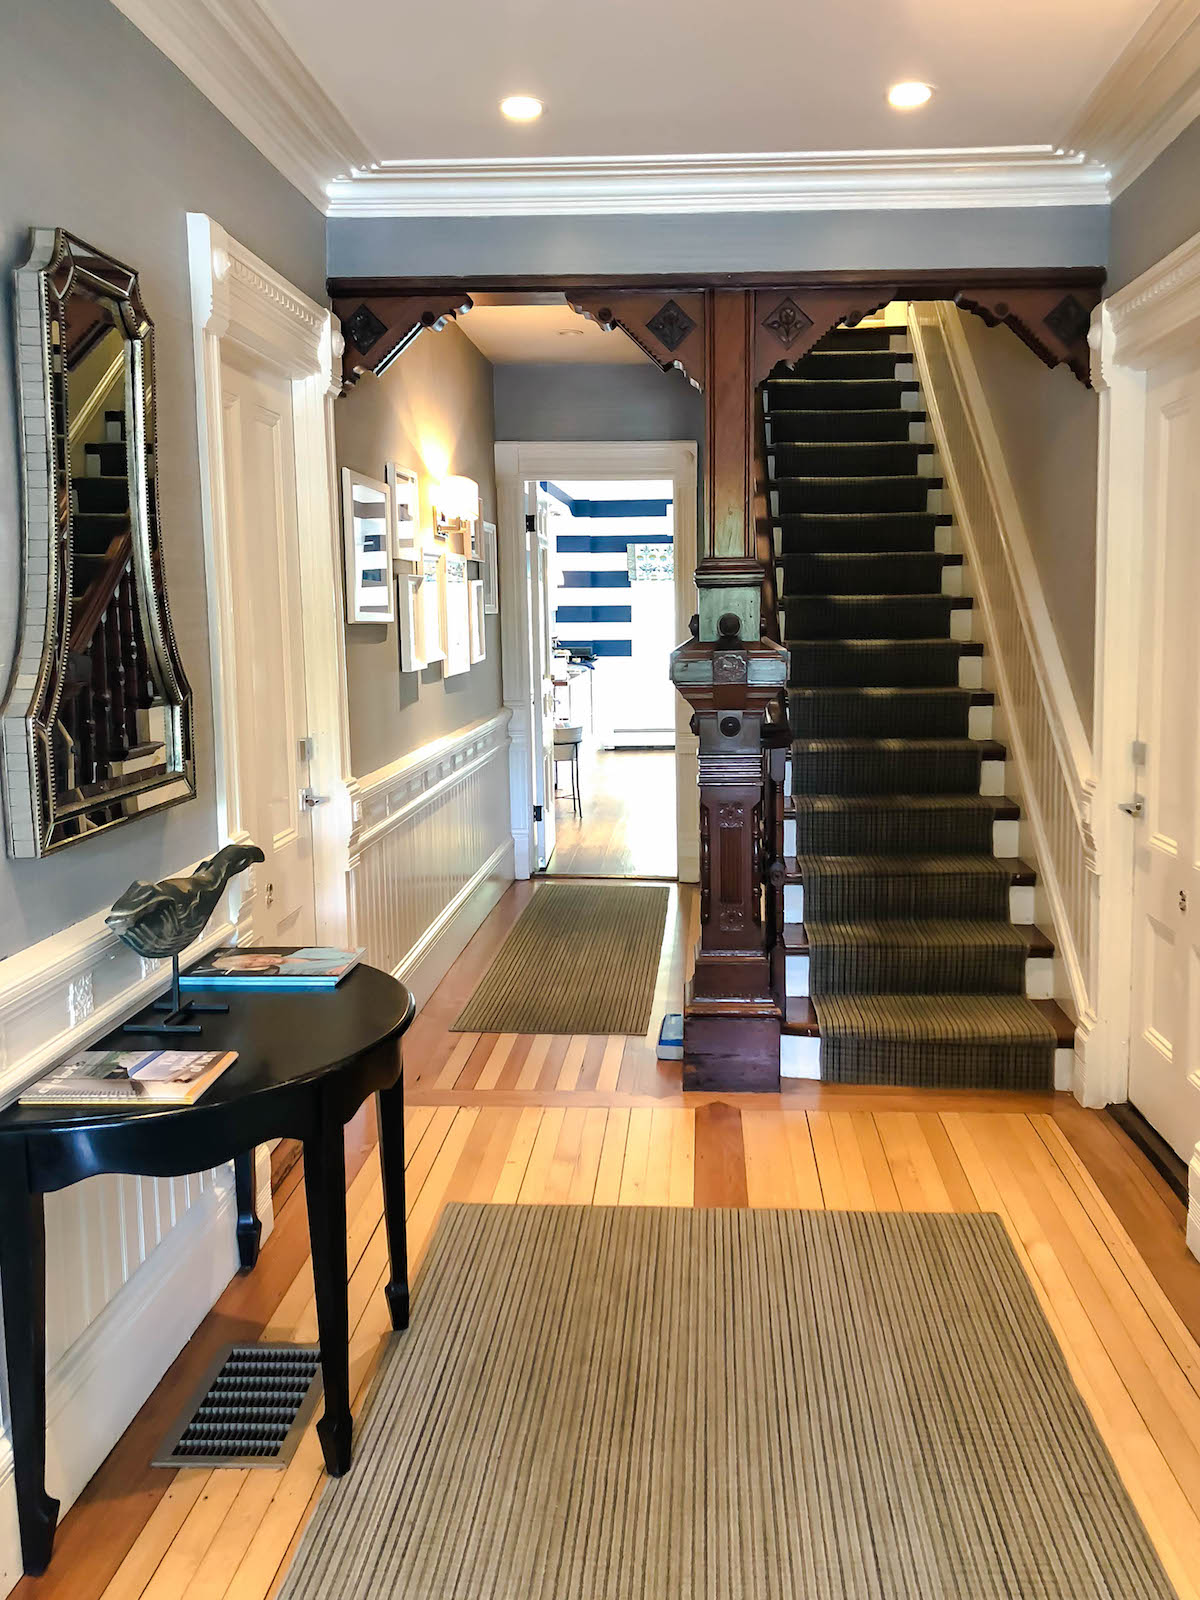 76 Main Nantucket Hotel